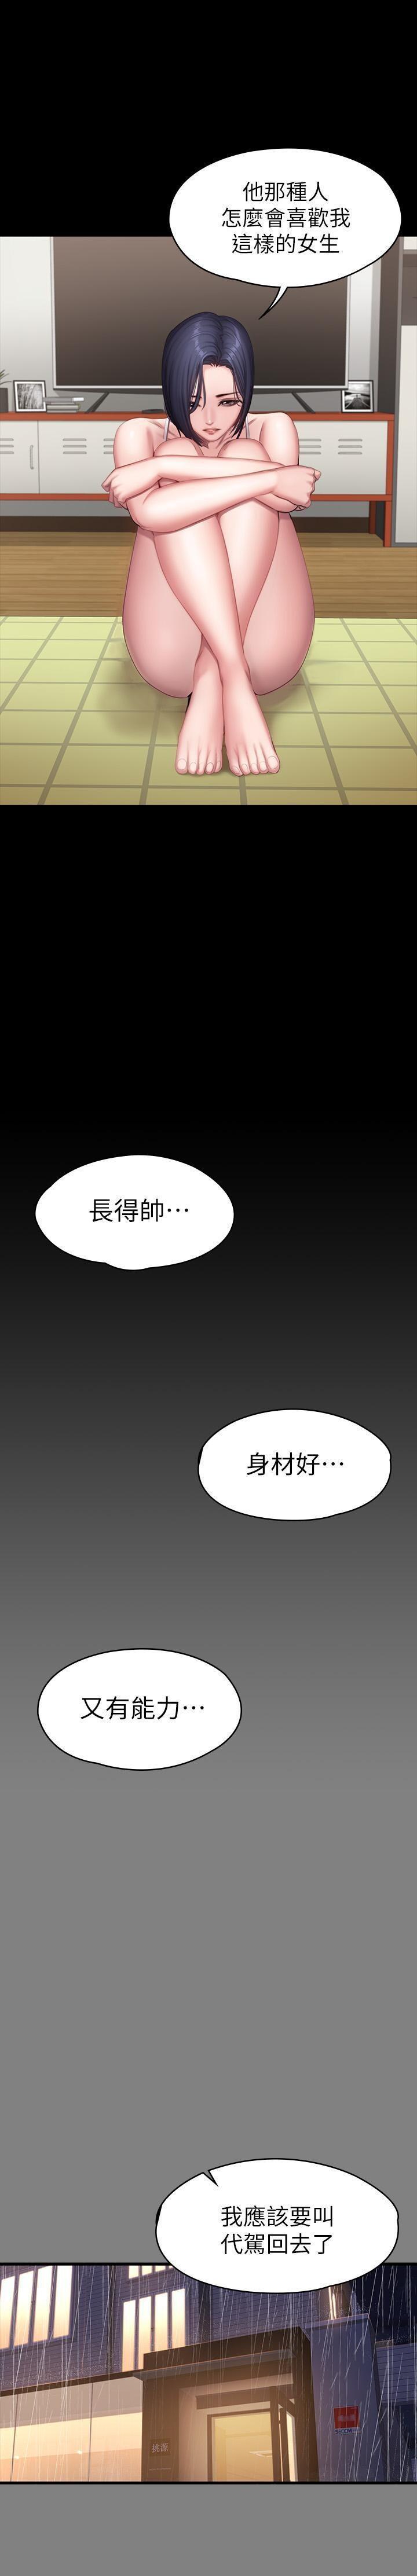 FITNESS 61-88 CHI 423